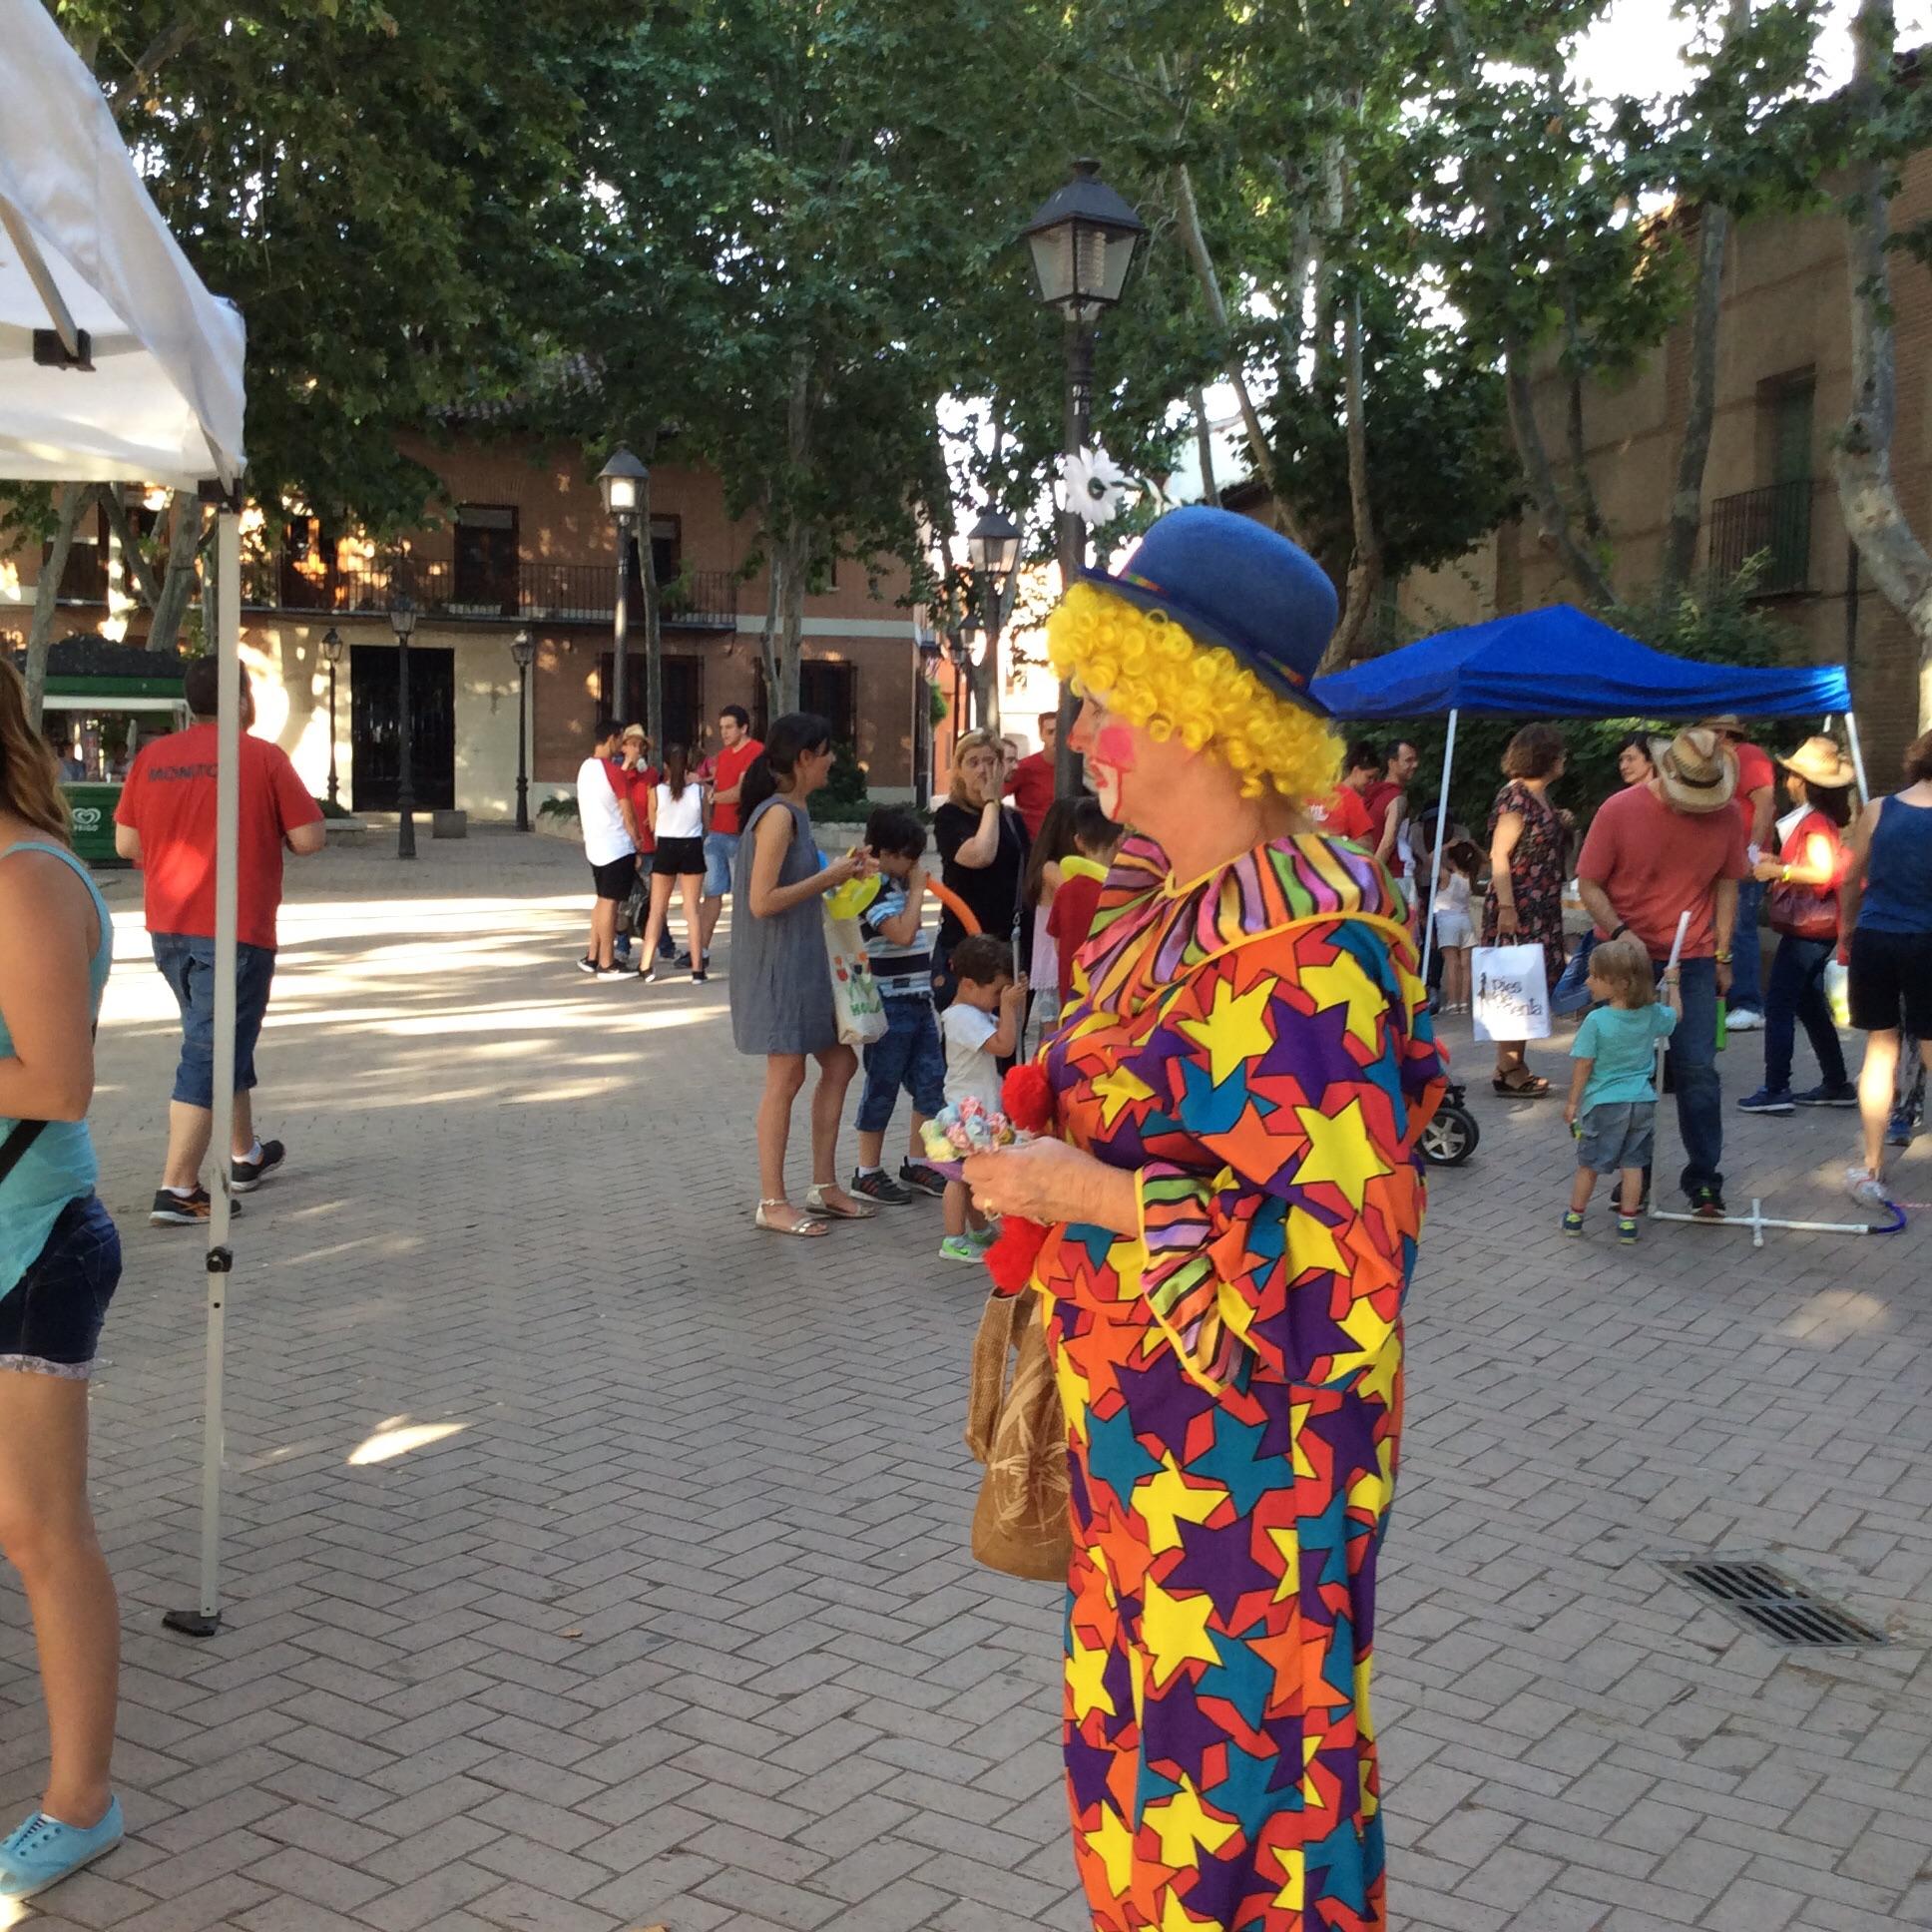 Send in the clowns (Marianne).